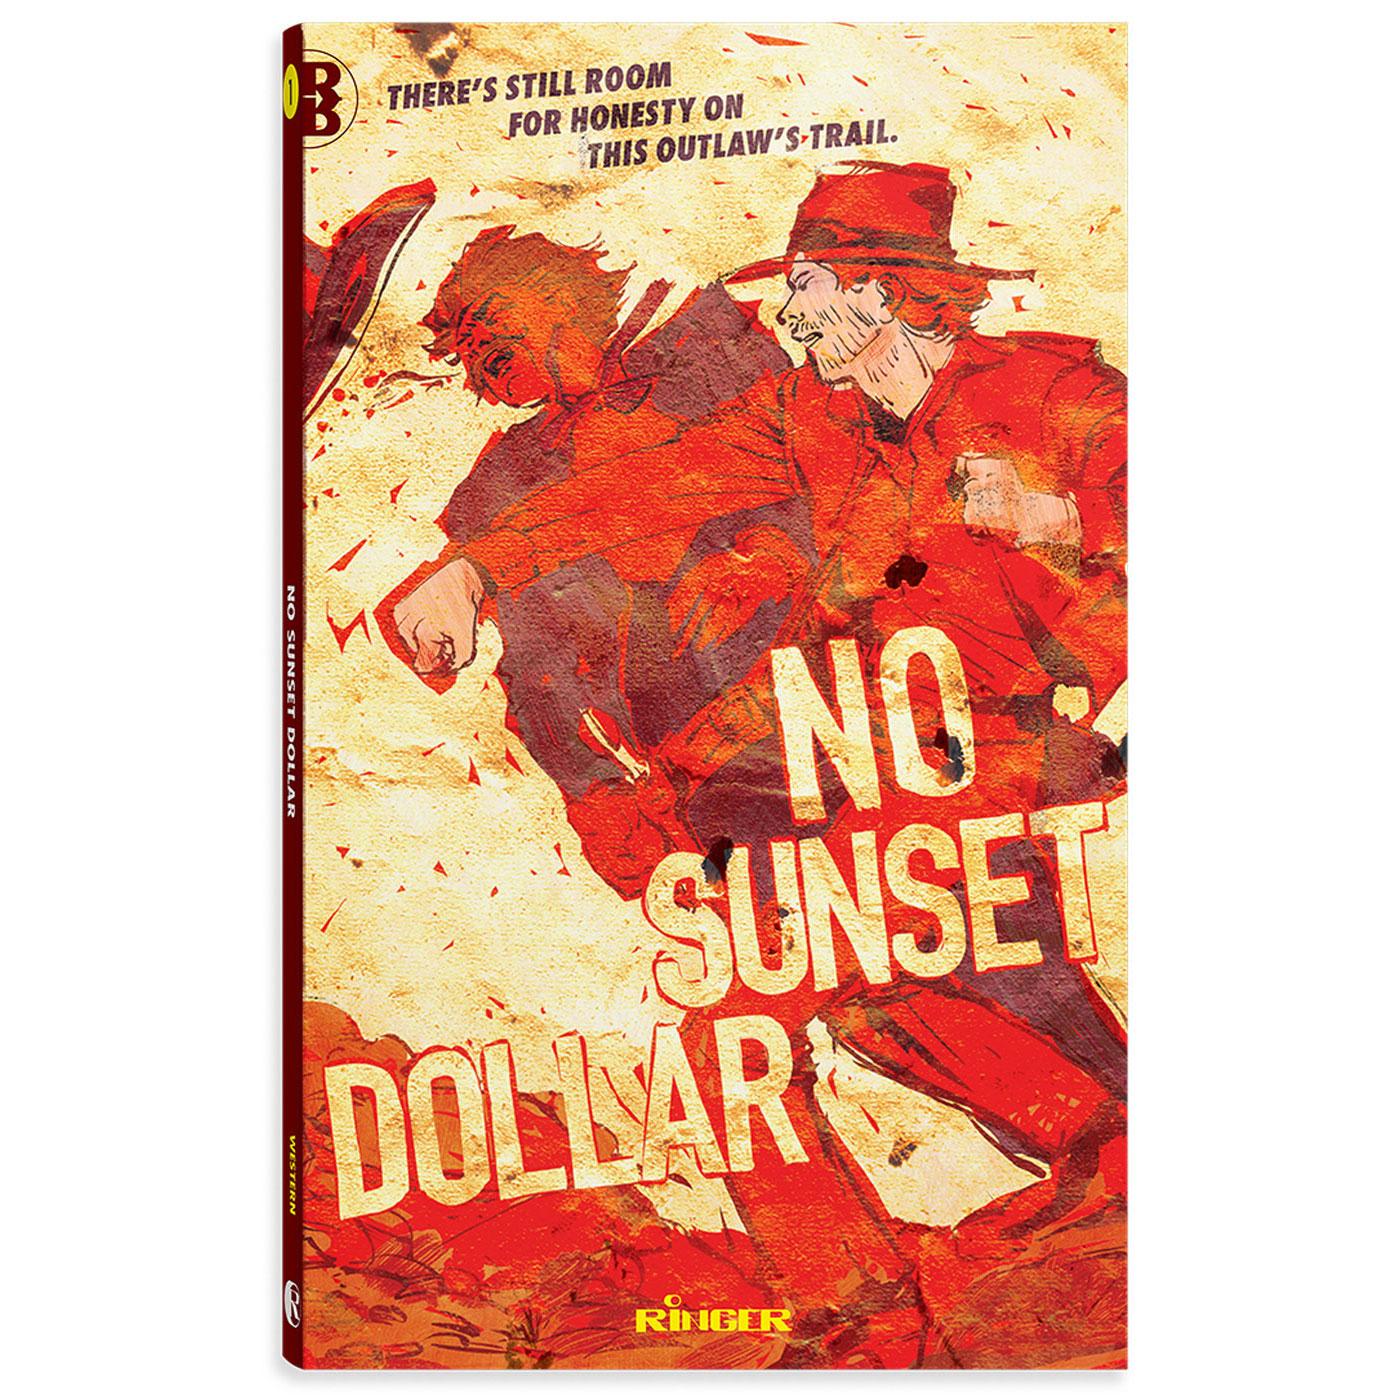 RP-J-WST01_No_Sunset_Dollar_Cover_w_Spine_WEB1400.jpg